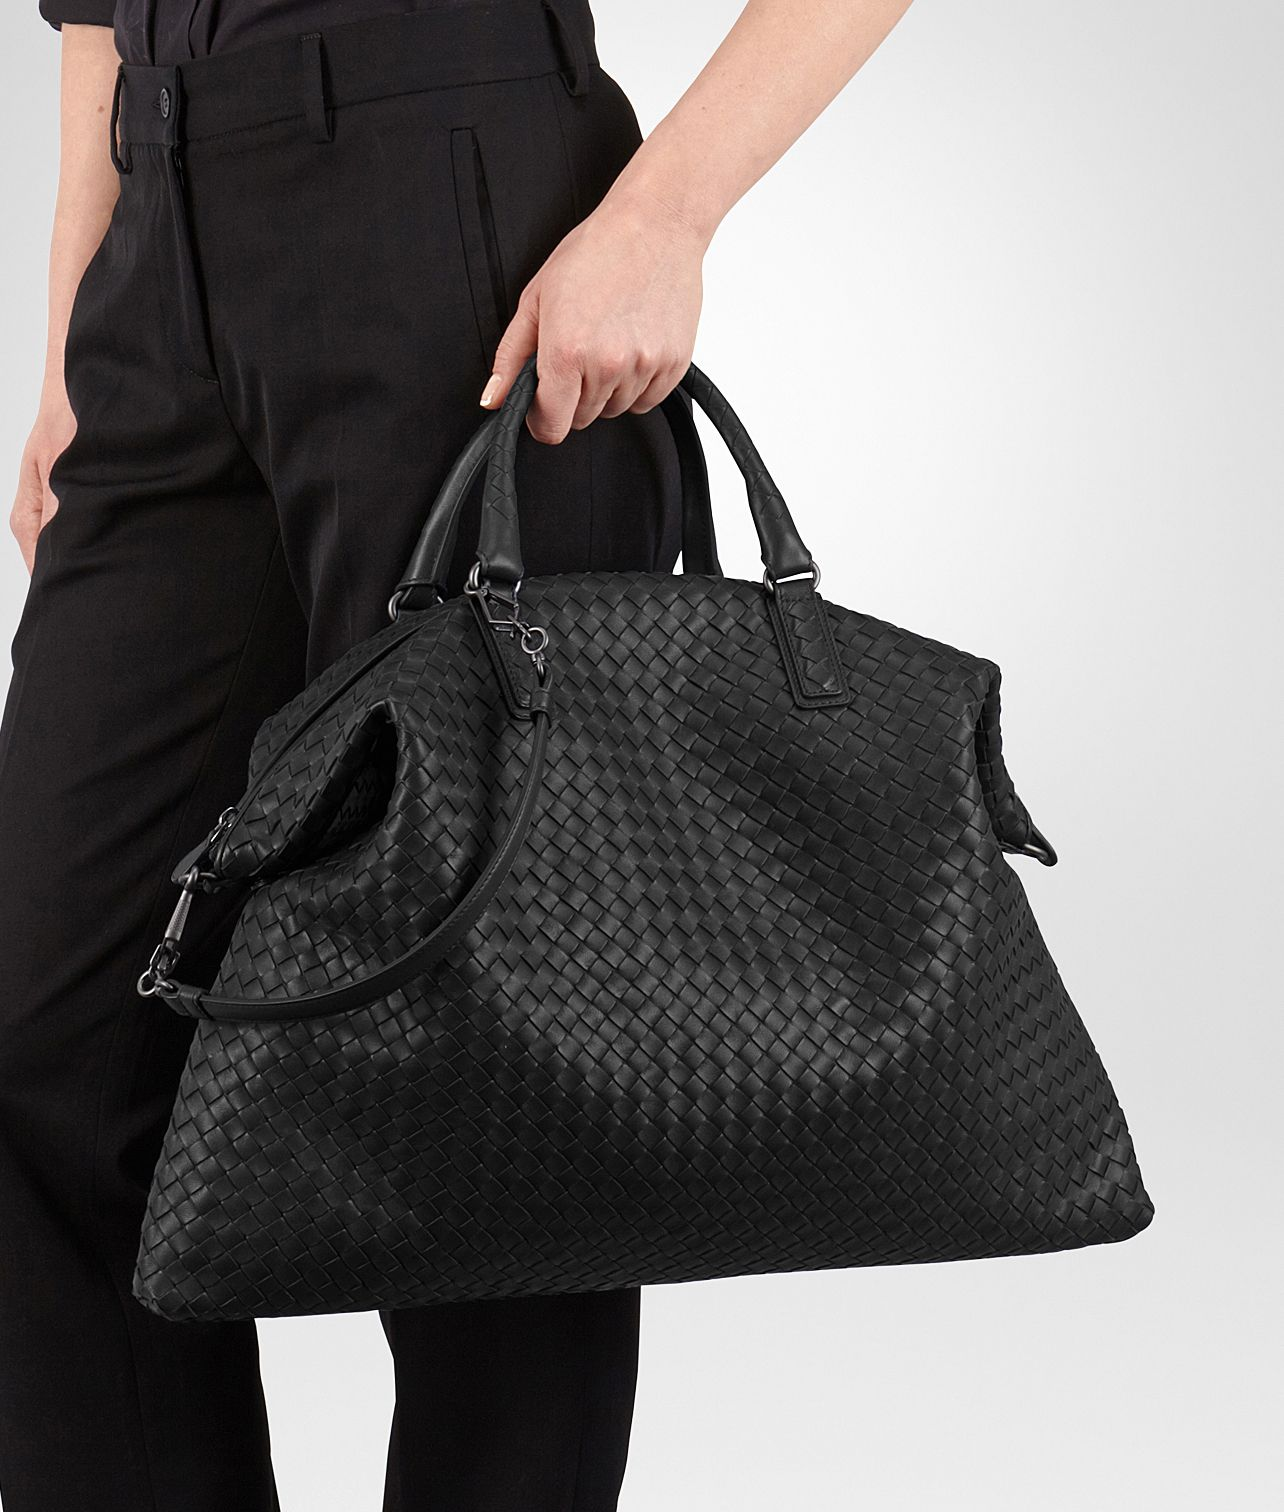 46c26ac4ba Bottega Veneta® - Nero Intrecciato Nappa Convertible Bag